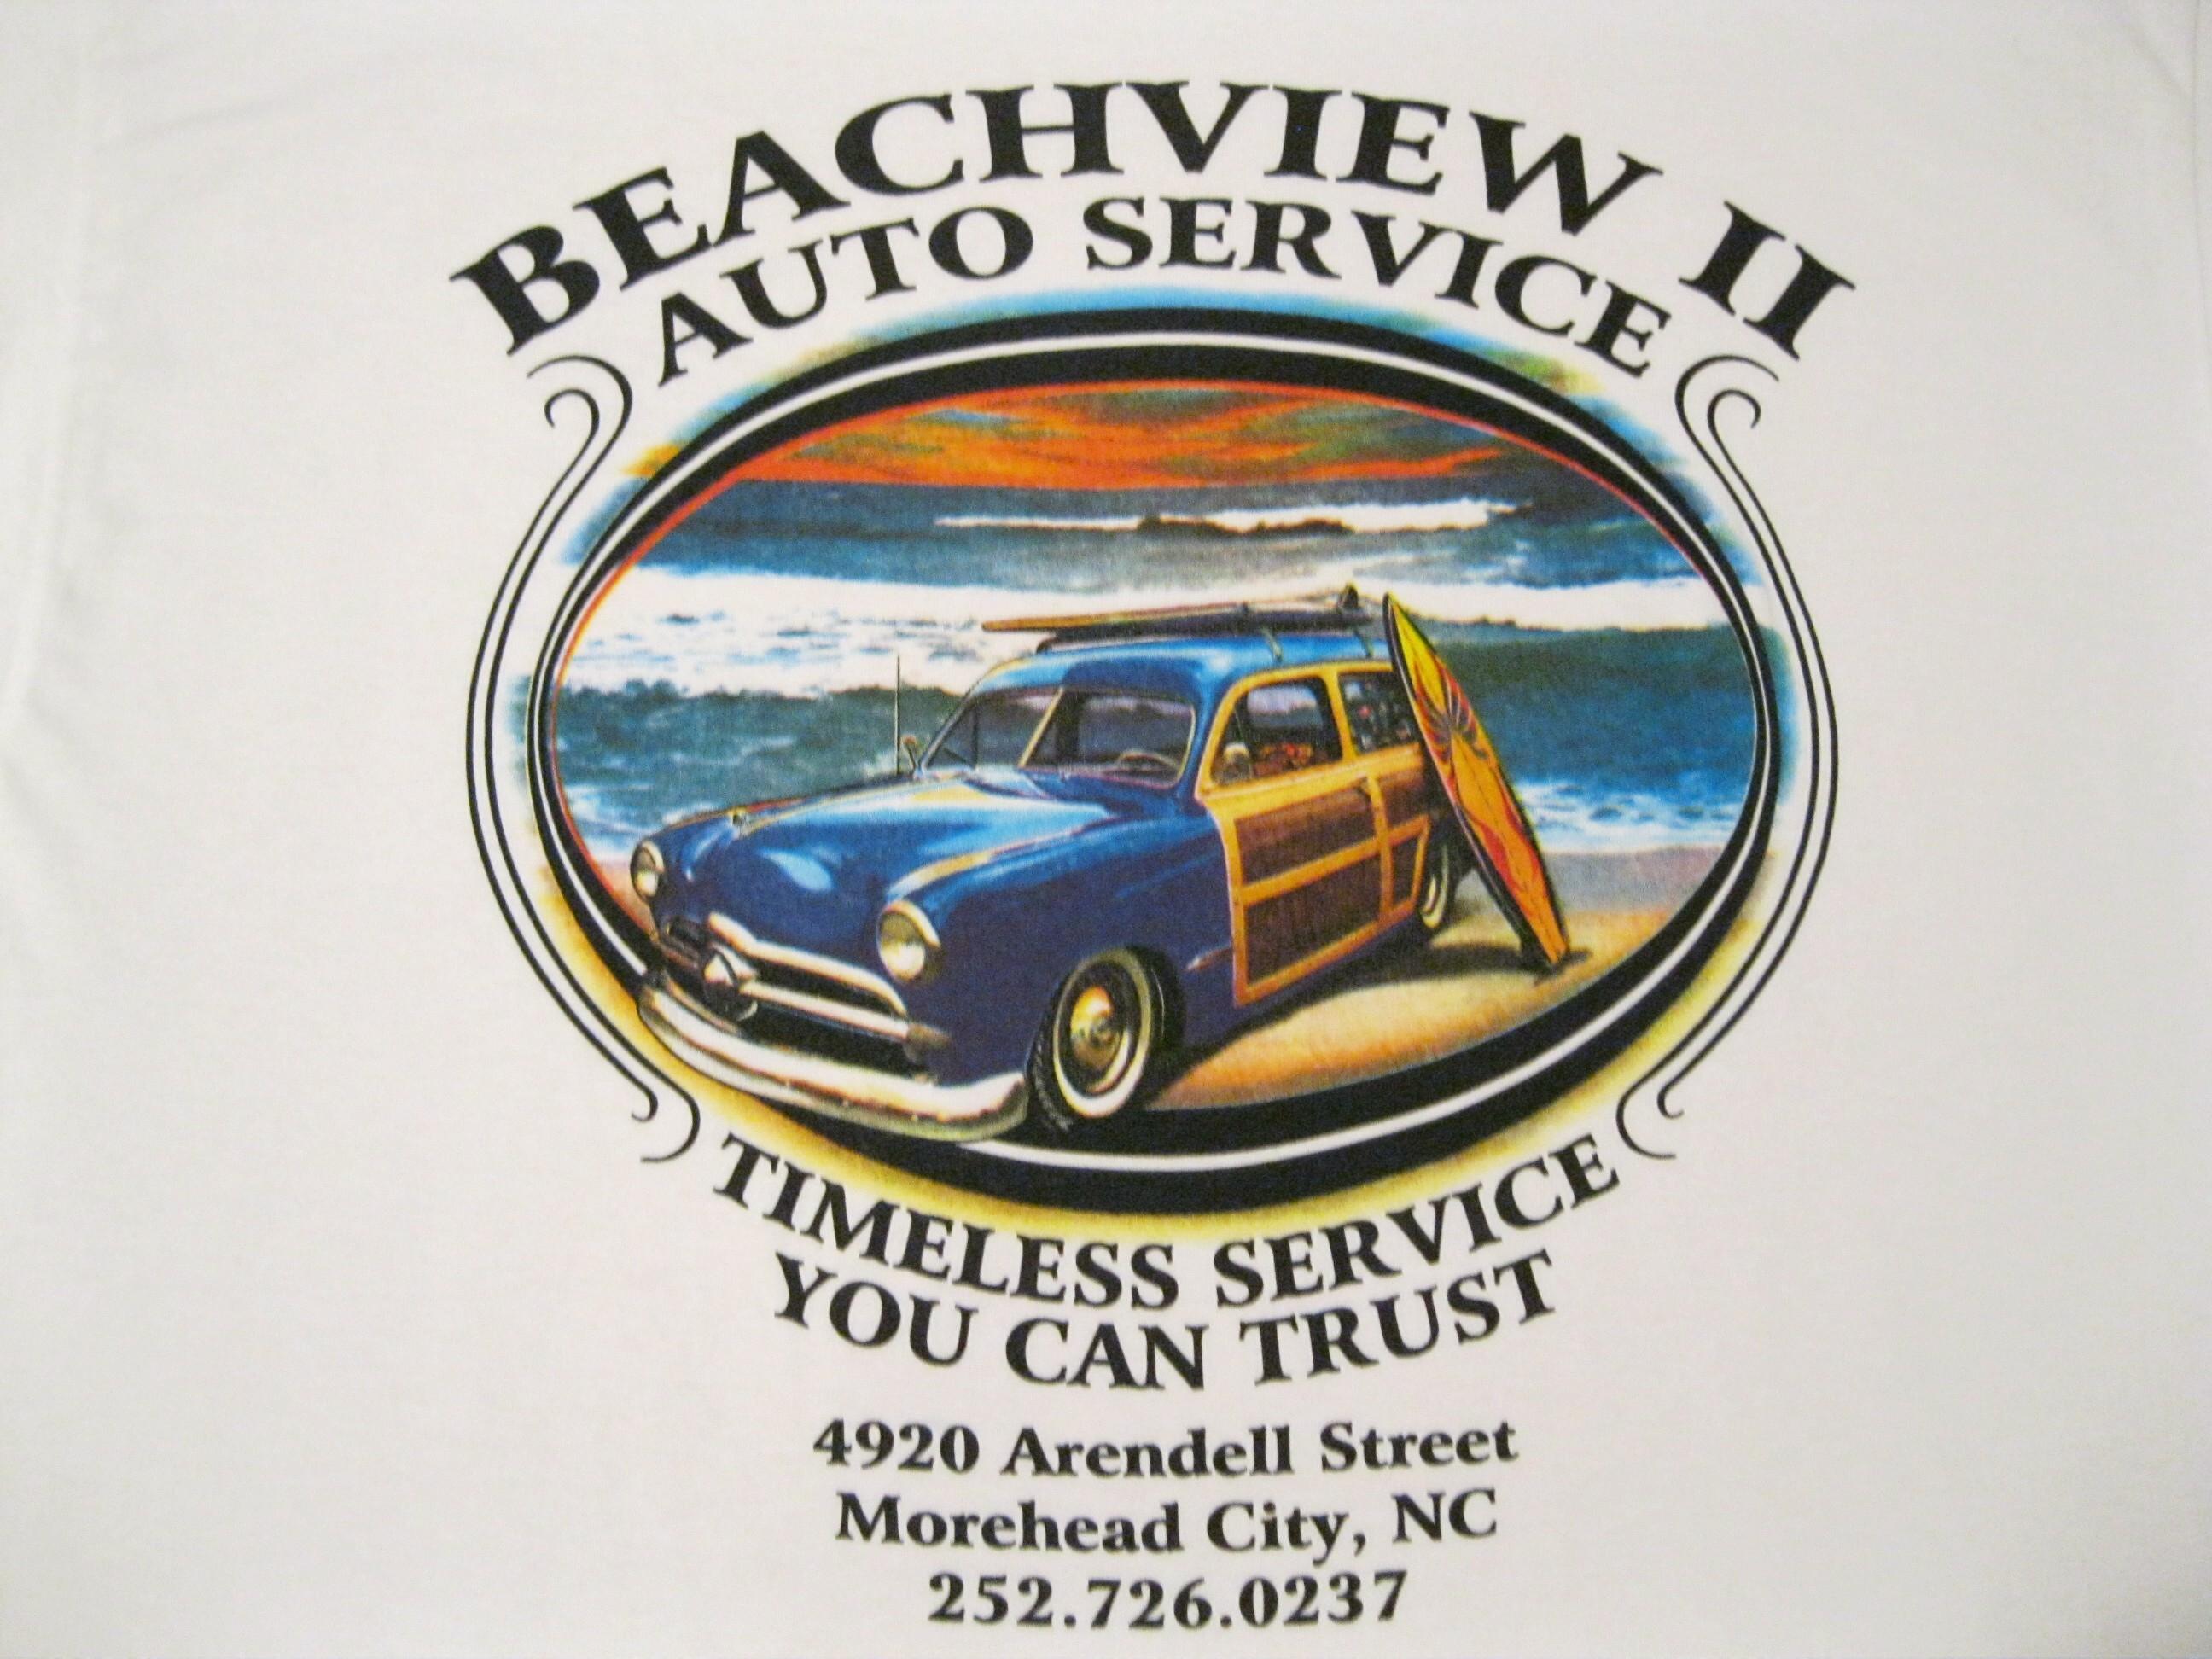 Beachview II Auto Service image 4